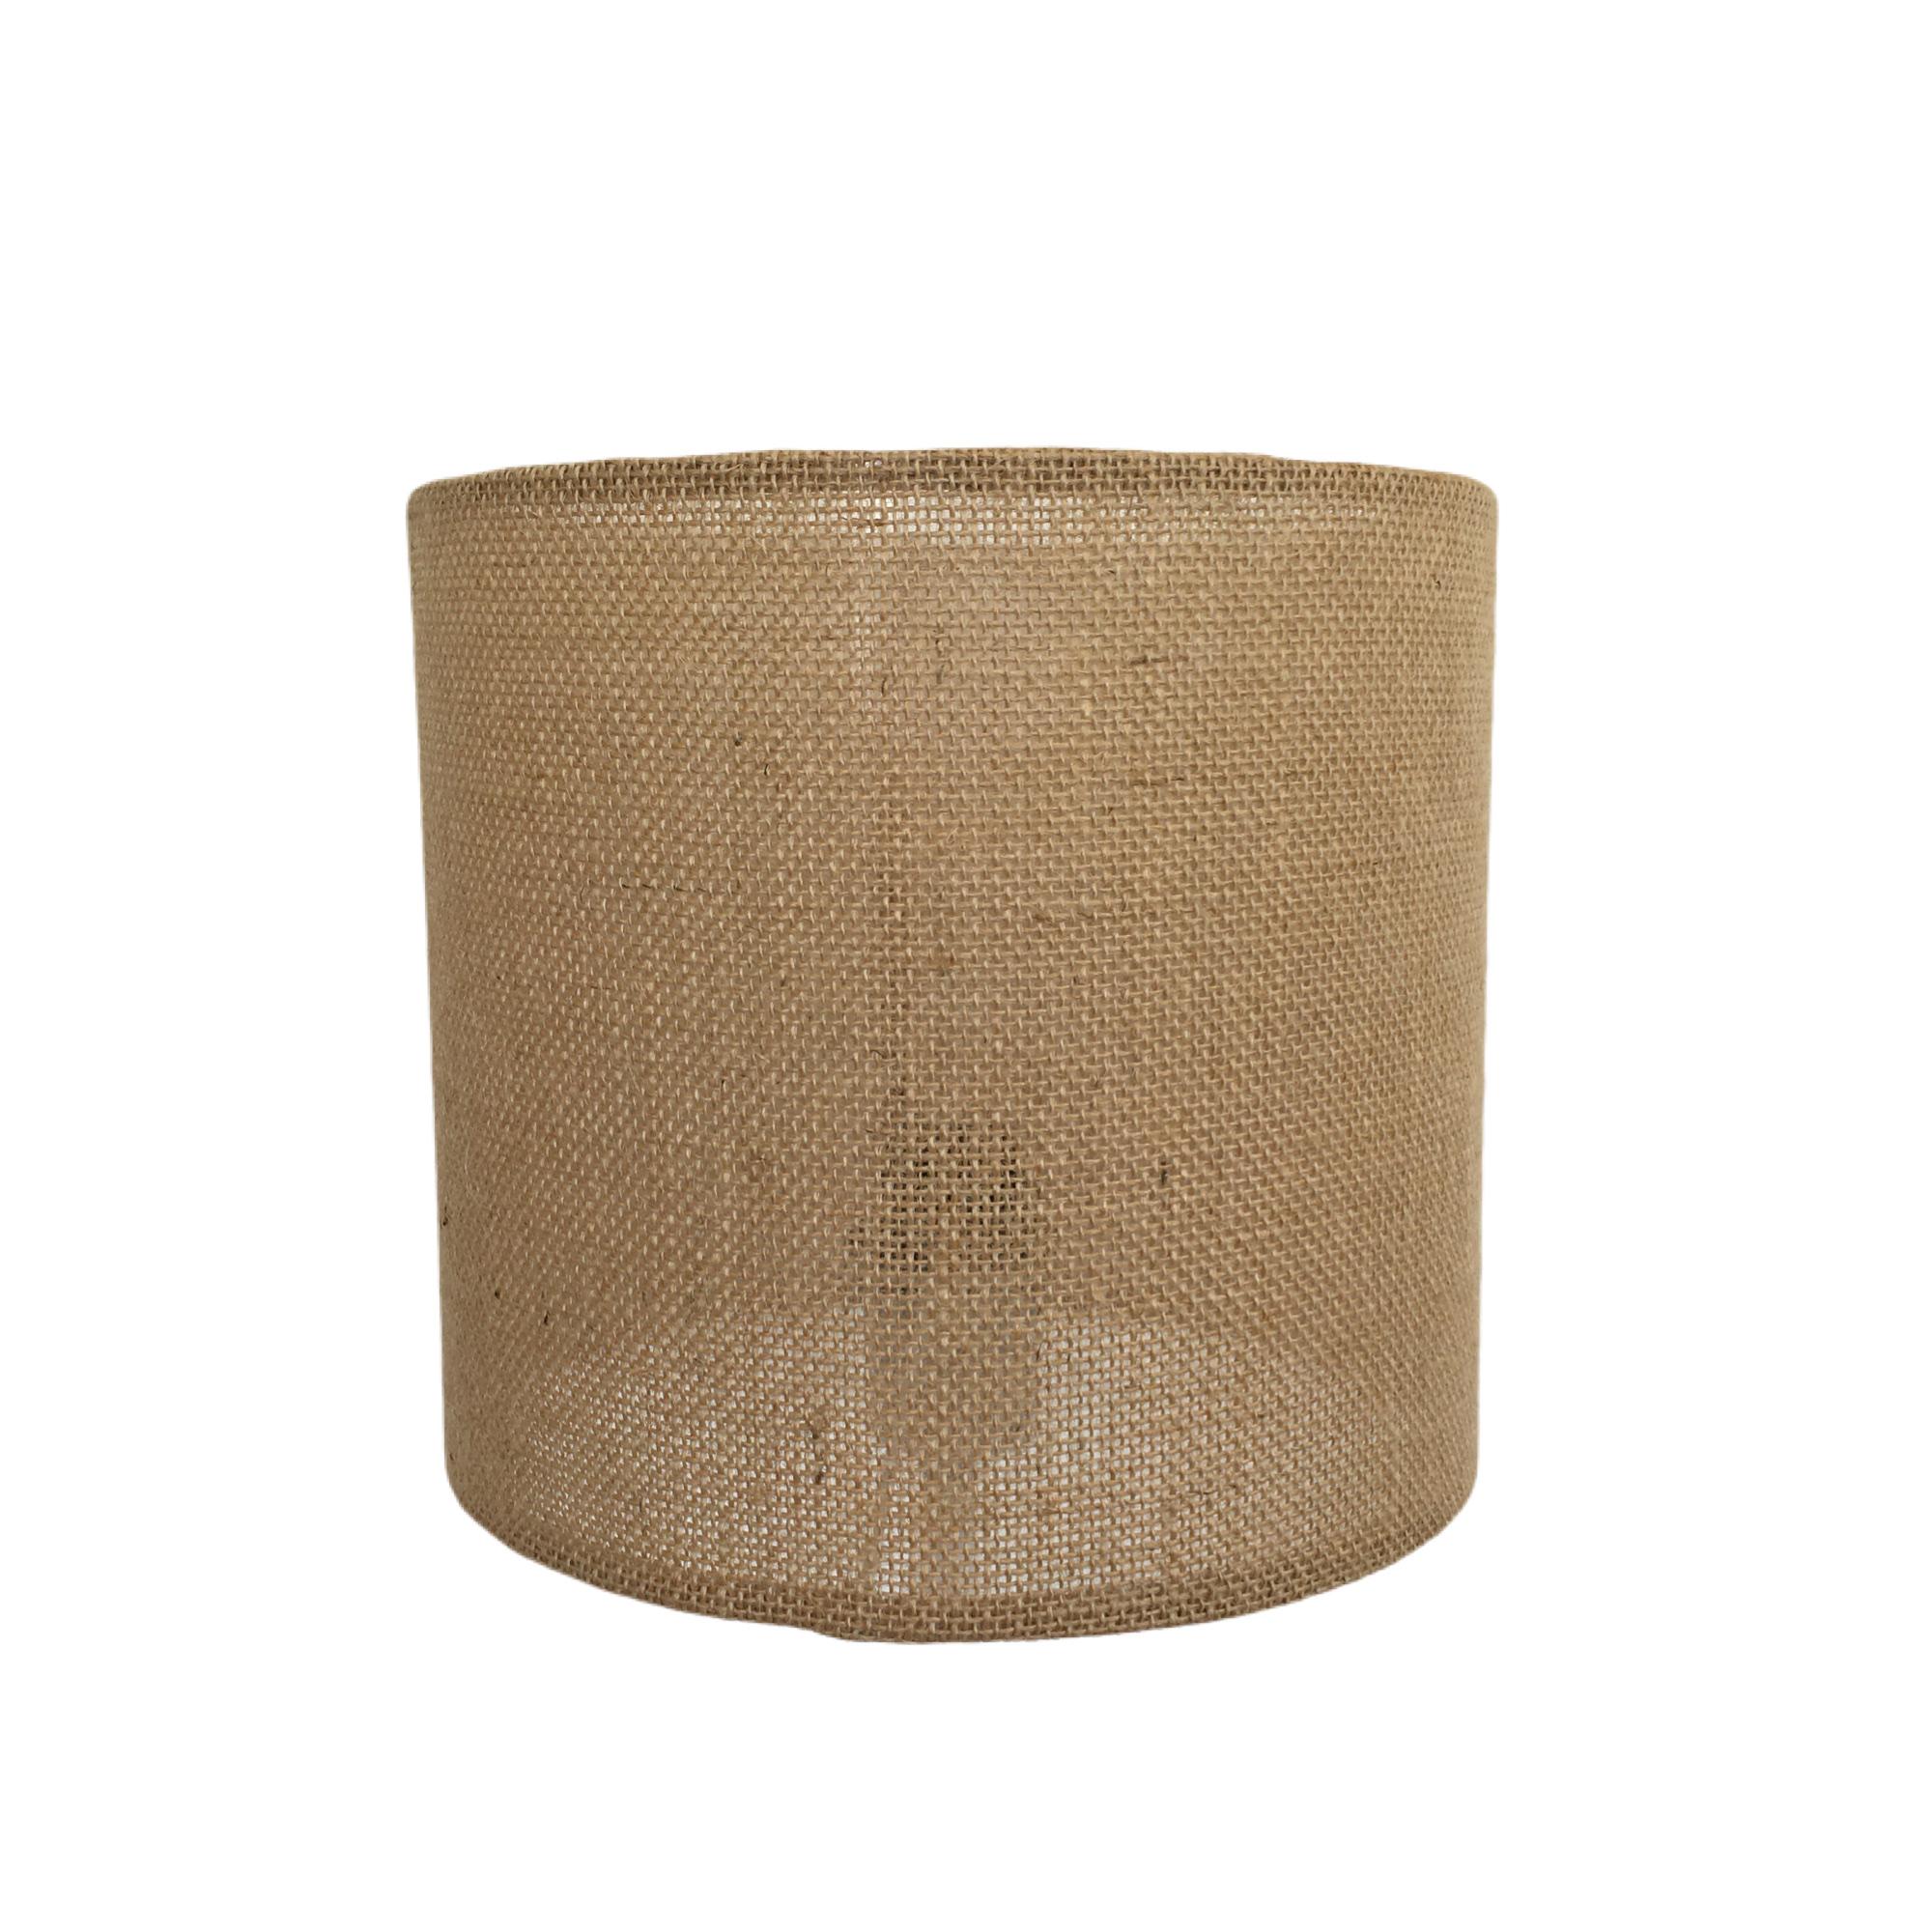 Suspension toile de jute diamètre 15 cm